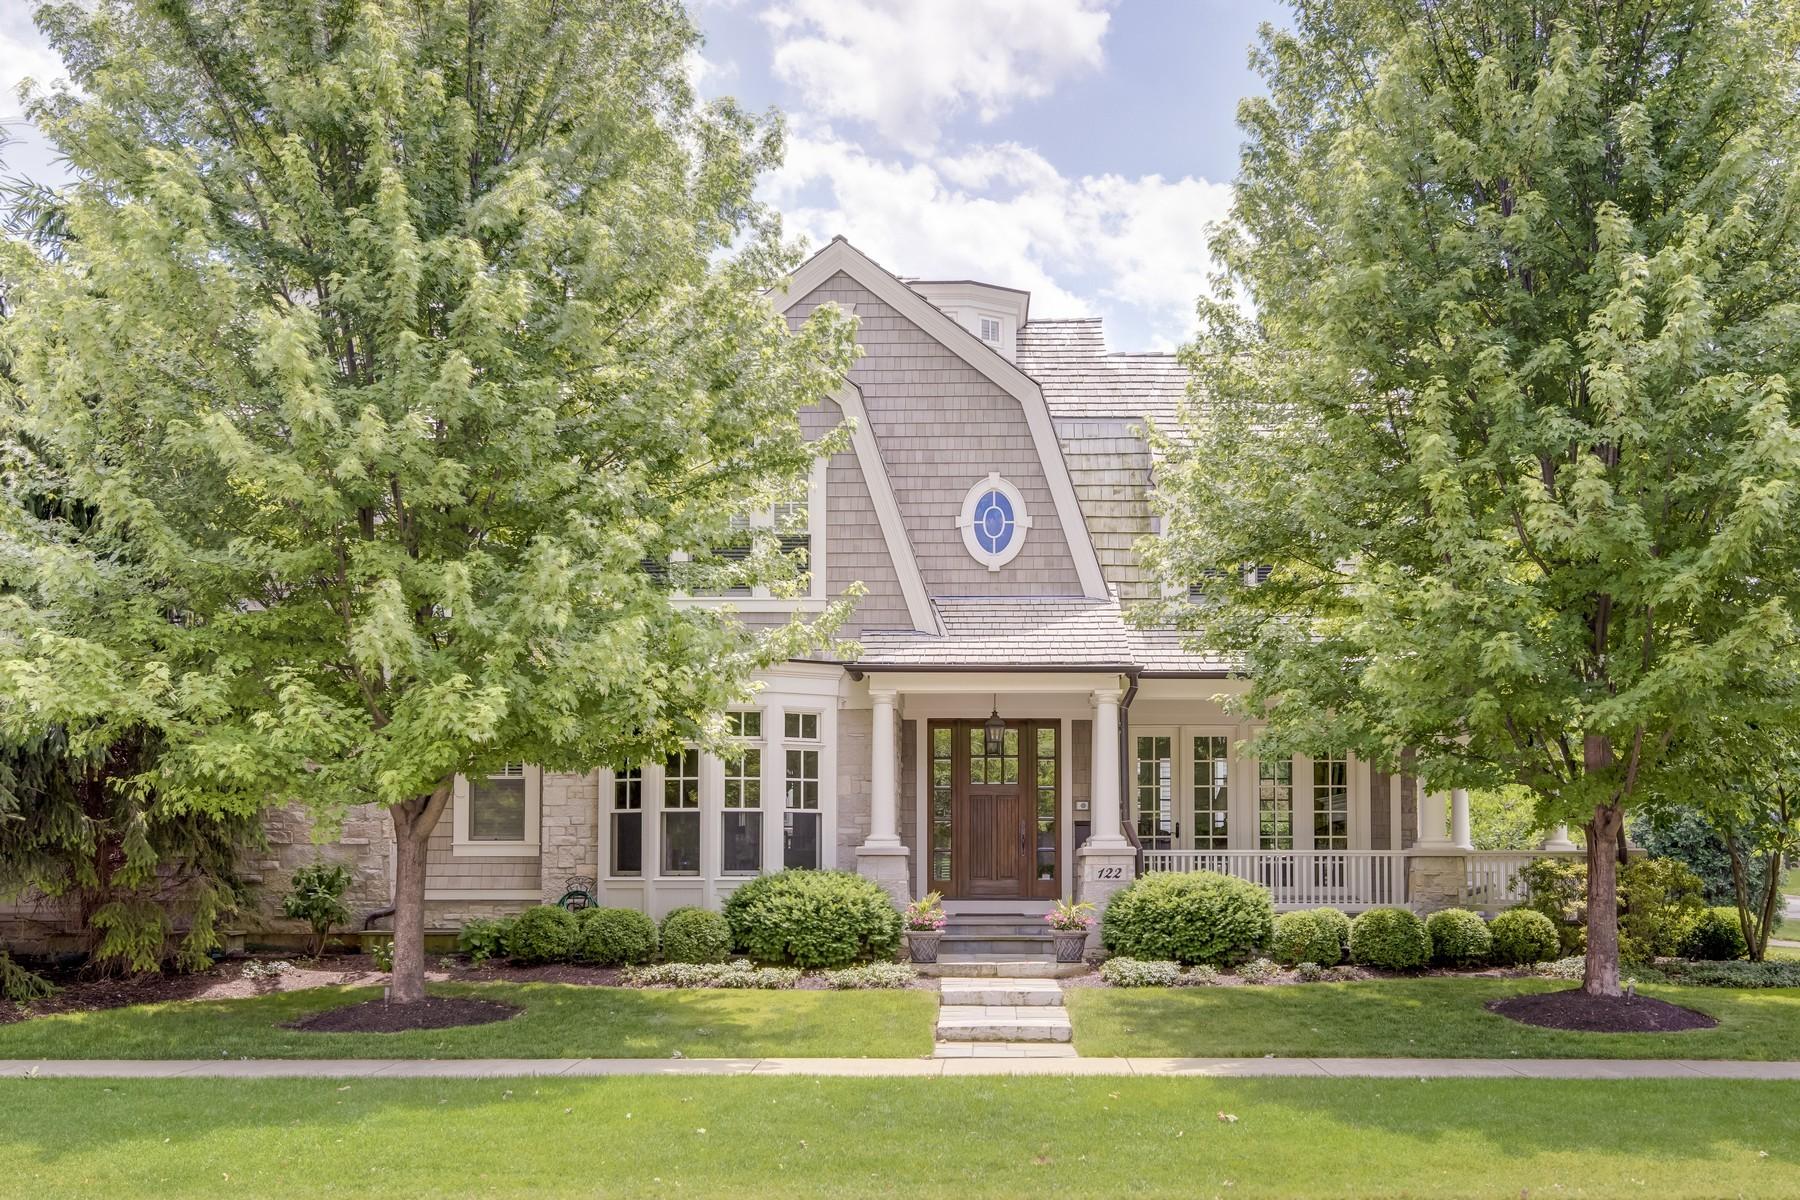 Villa per Vendita alle ore 122 West North, Hinsdale 122 West North Street Hinsdale, Illinois, 60521 Stati Uniti